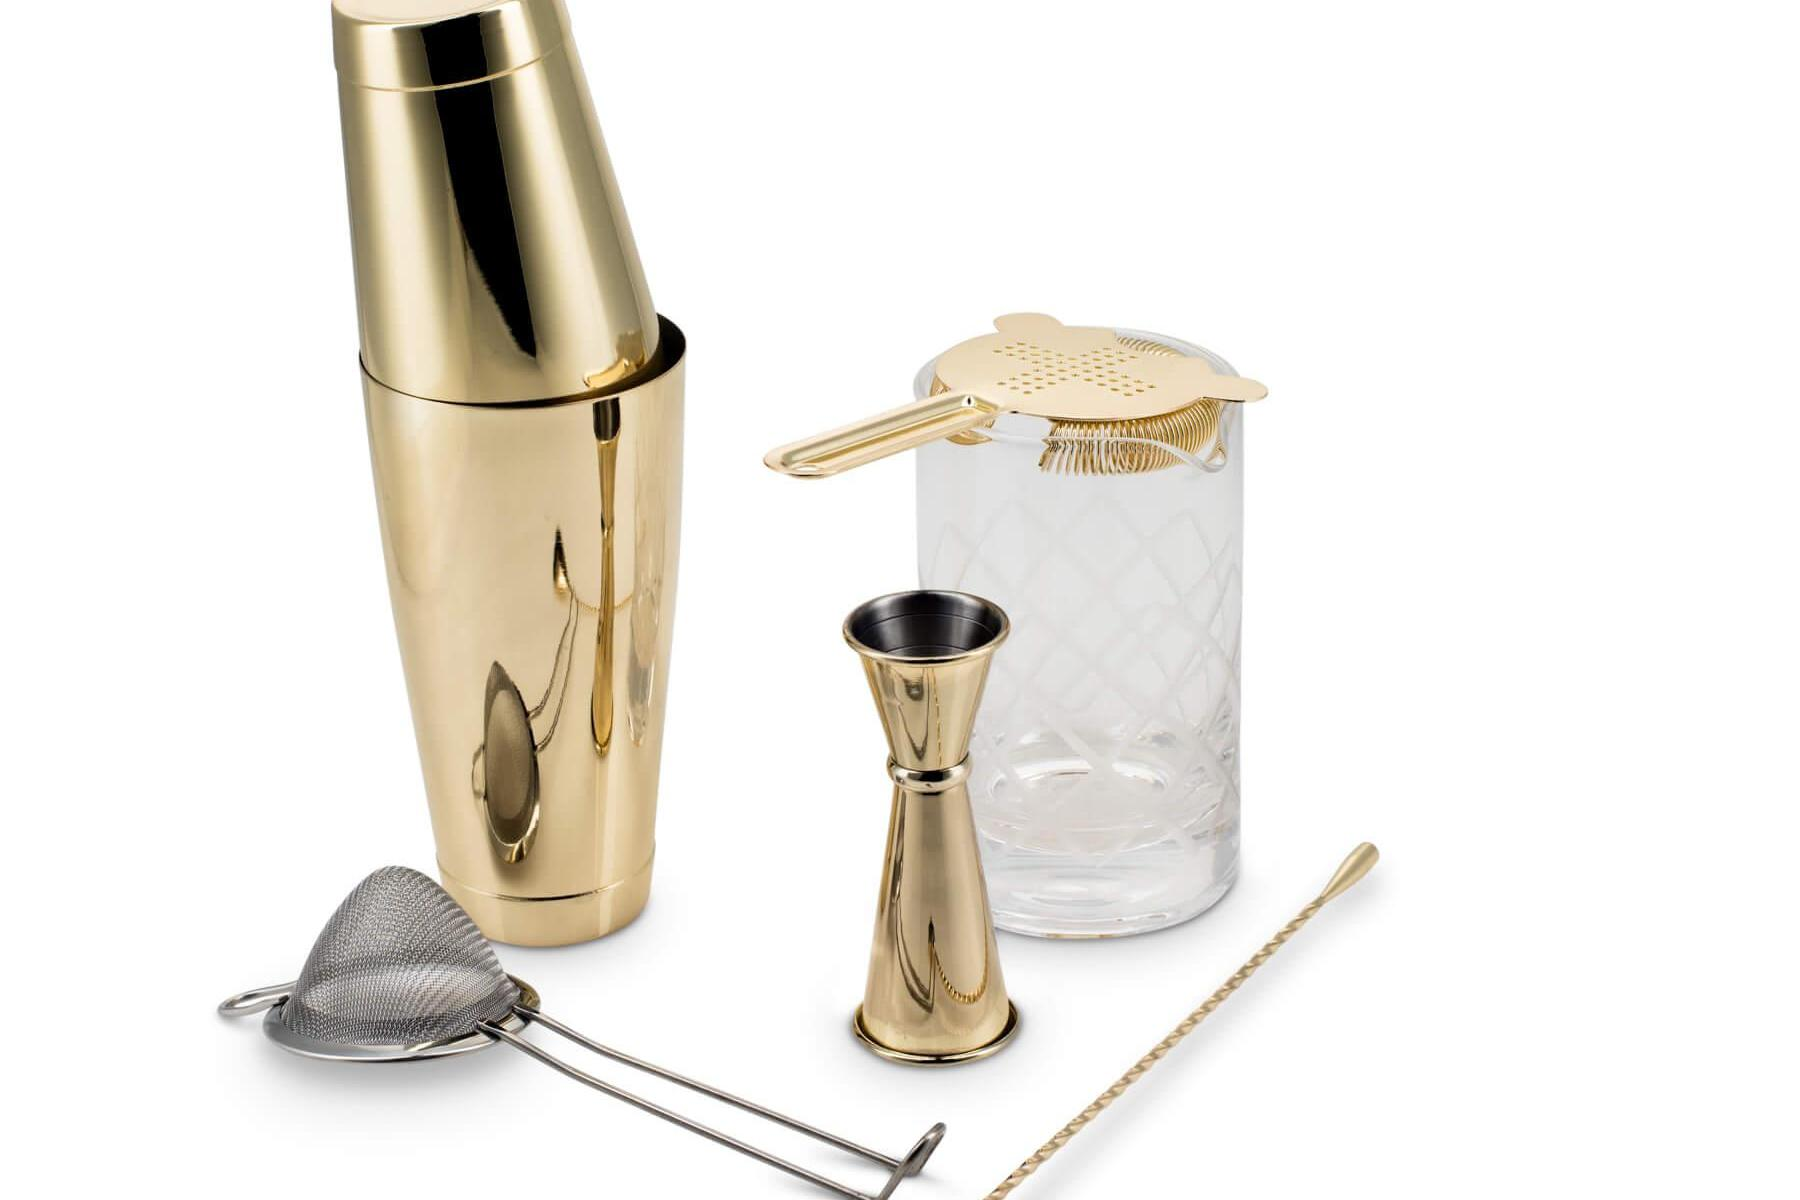 Gold Plated Shaken & Stirred Barware Set Fifth & Vermouth